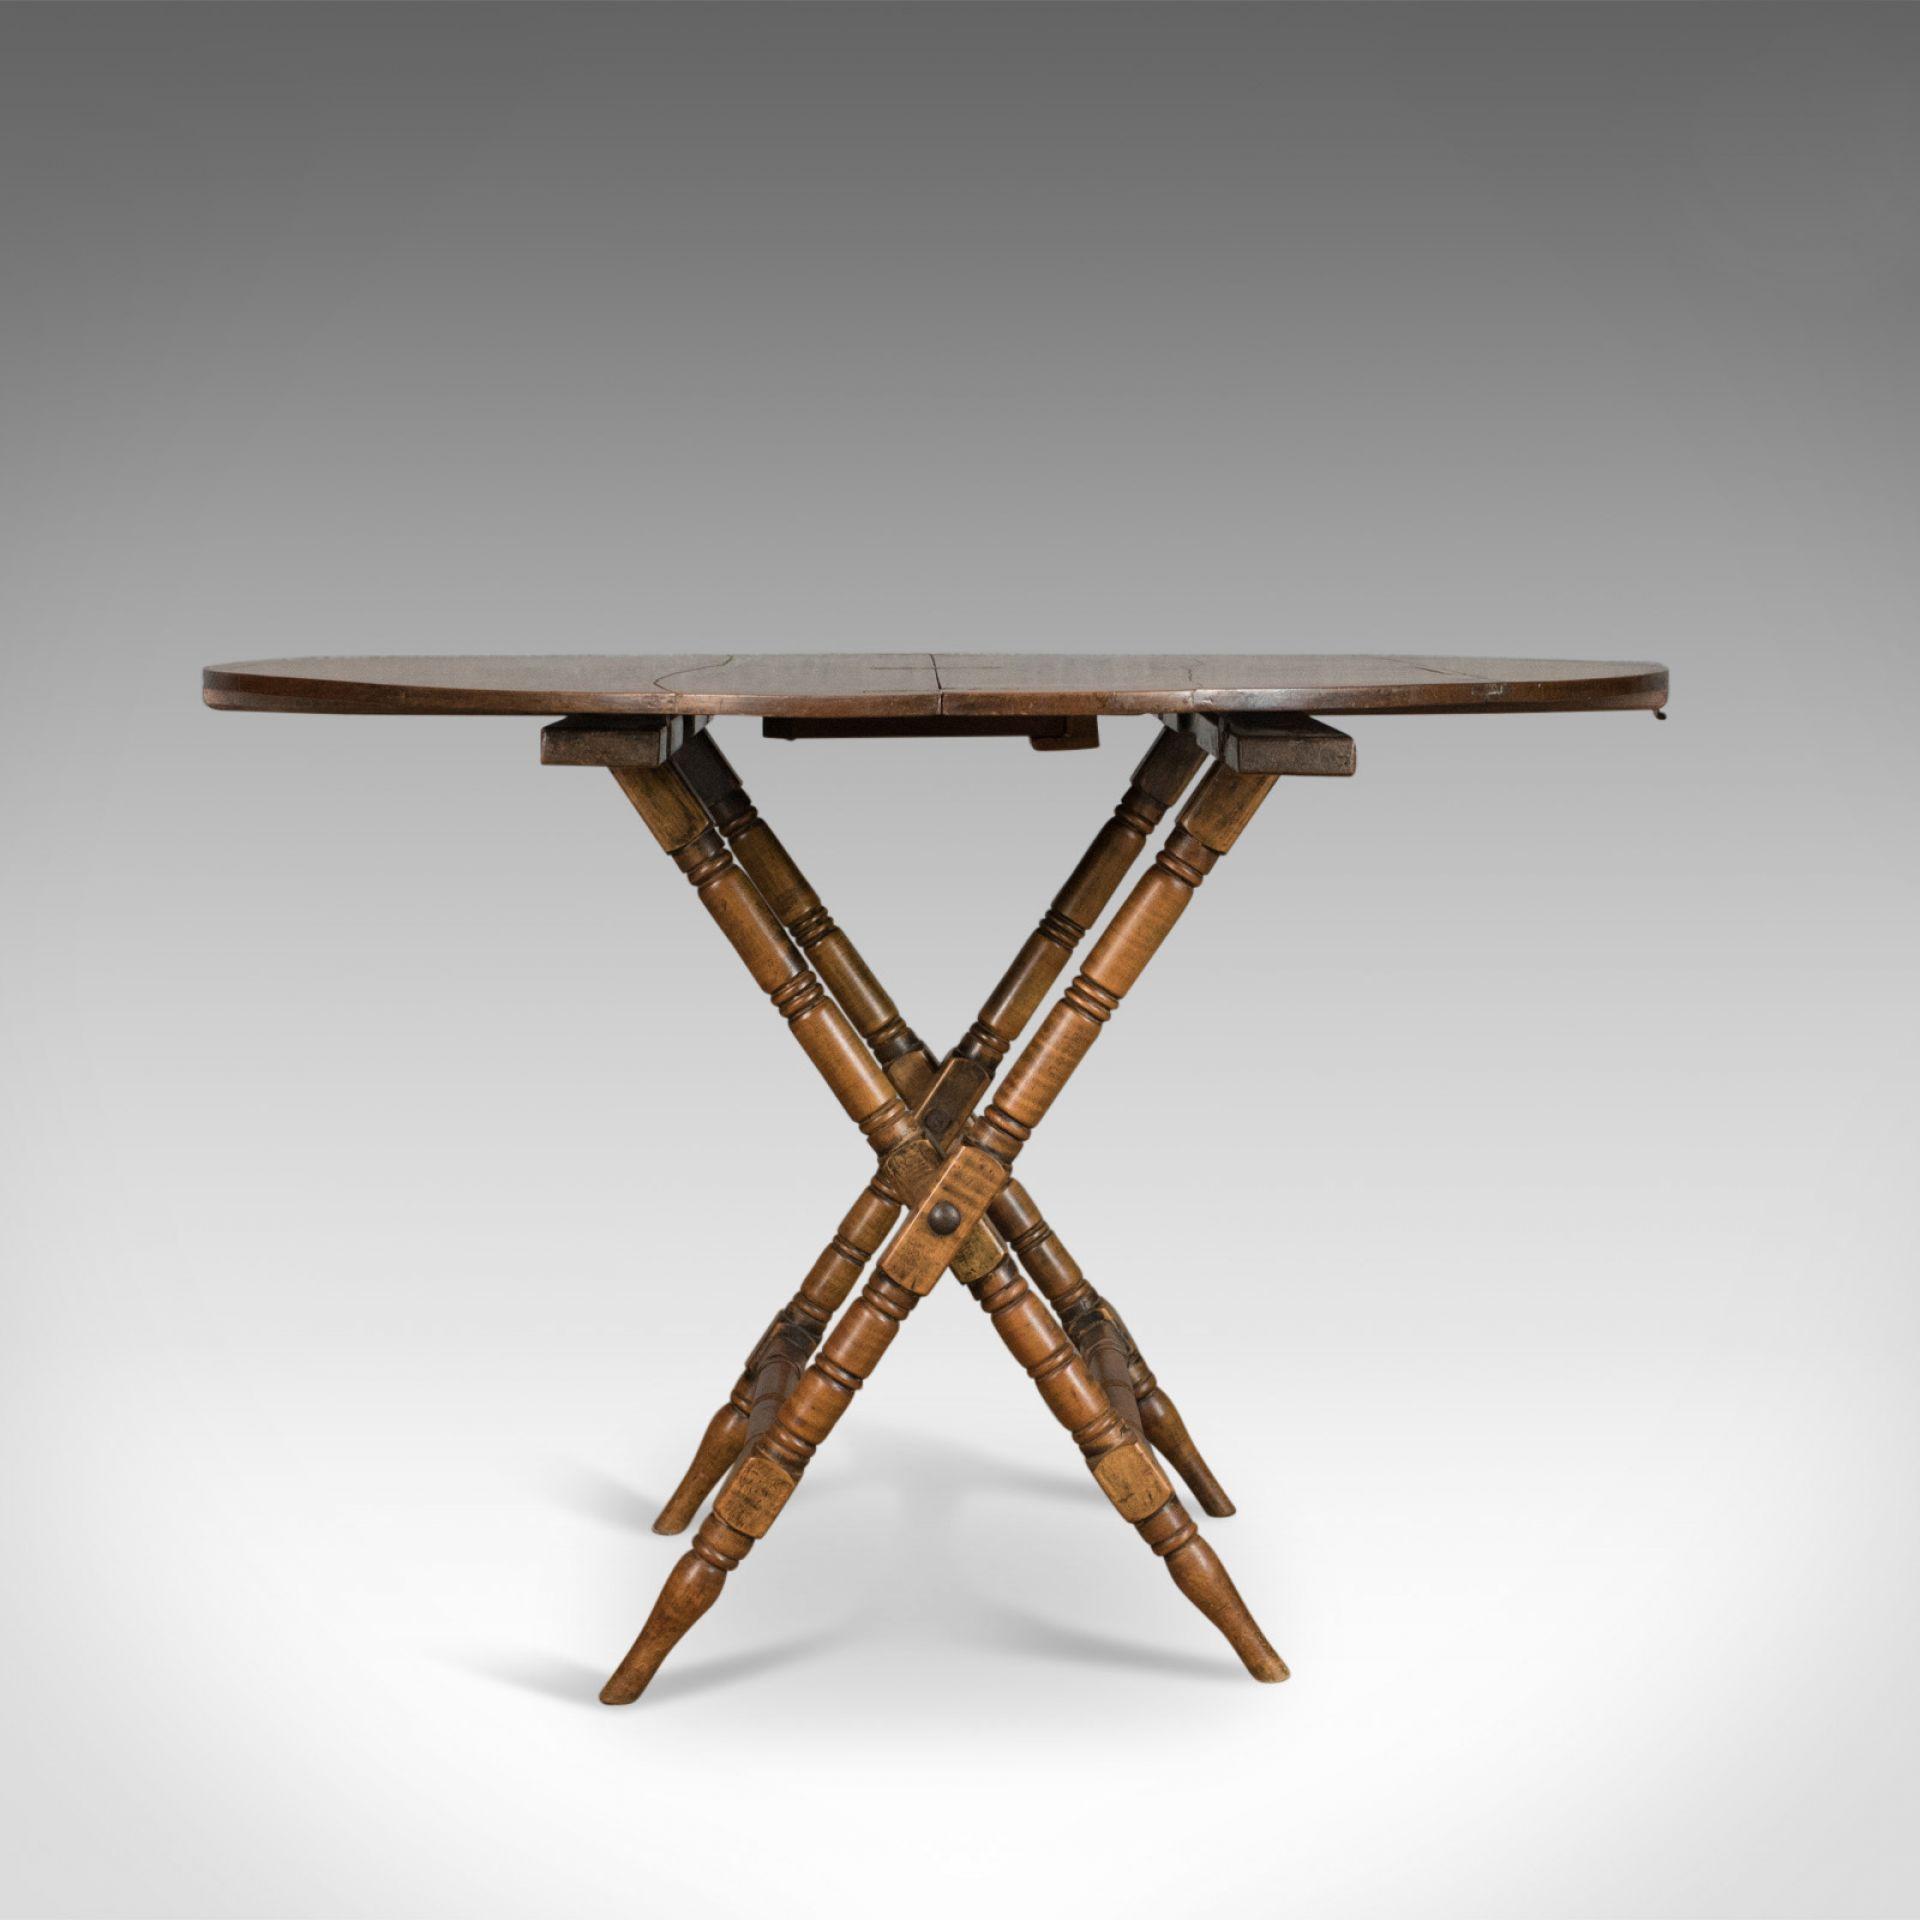 Antique Campaign Table, English, Victorian, Folding, Beech, Fruitwood Circa 1890